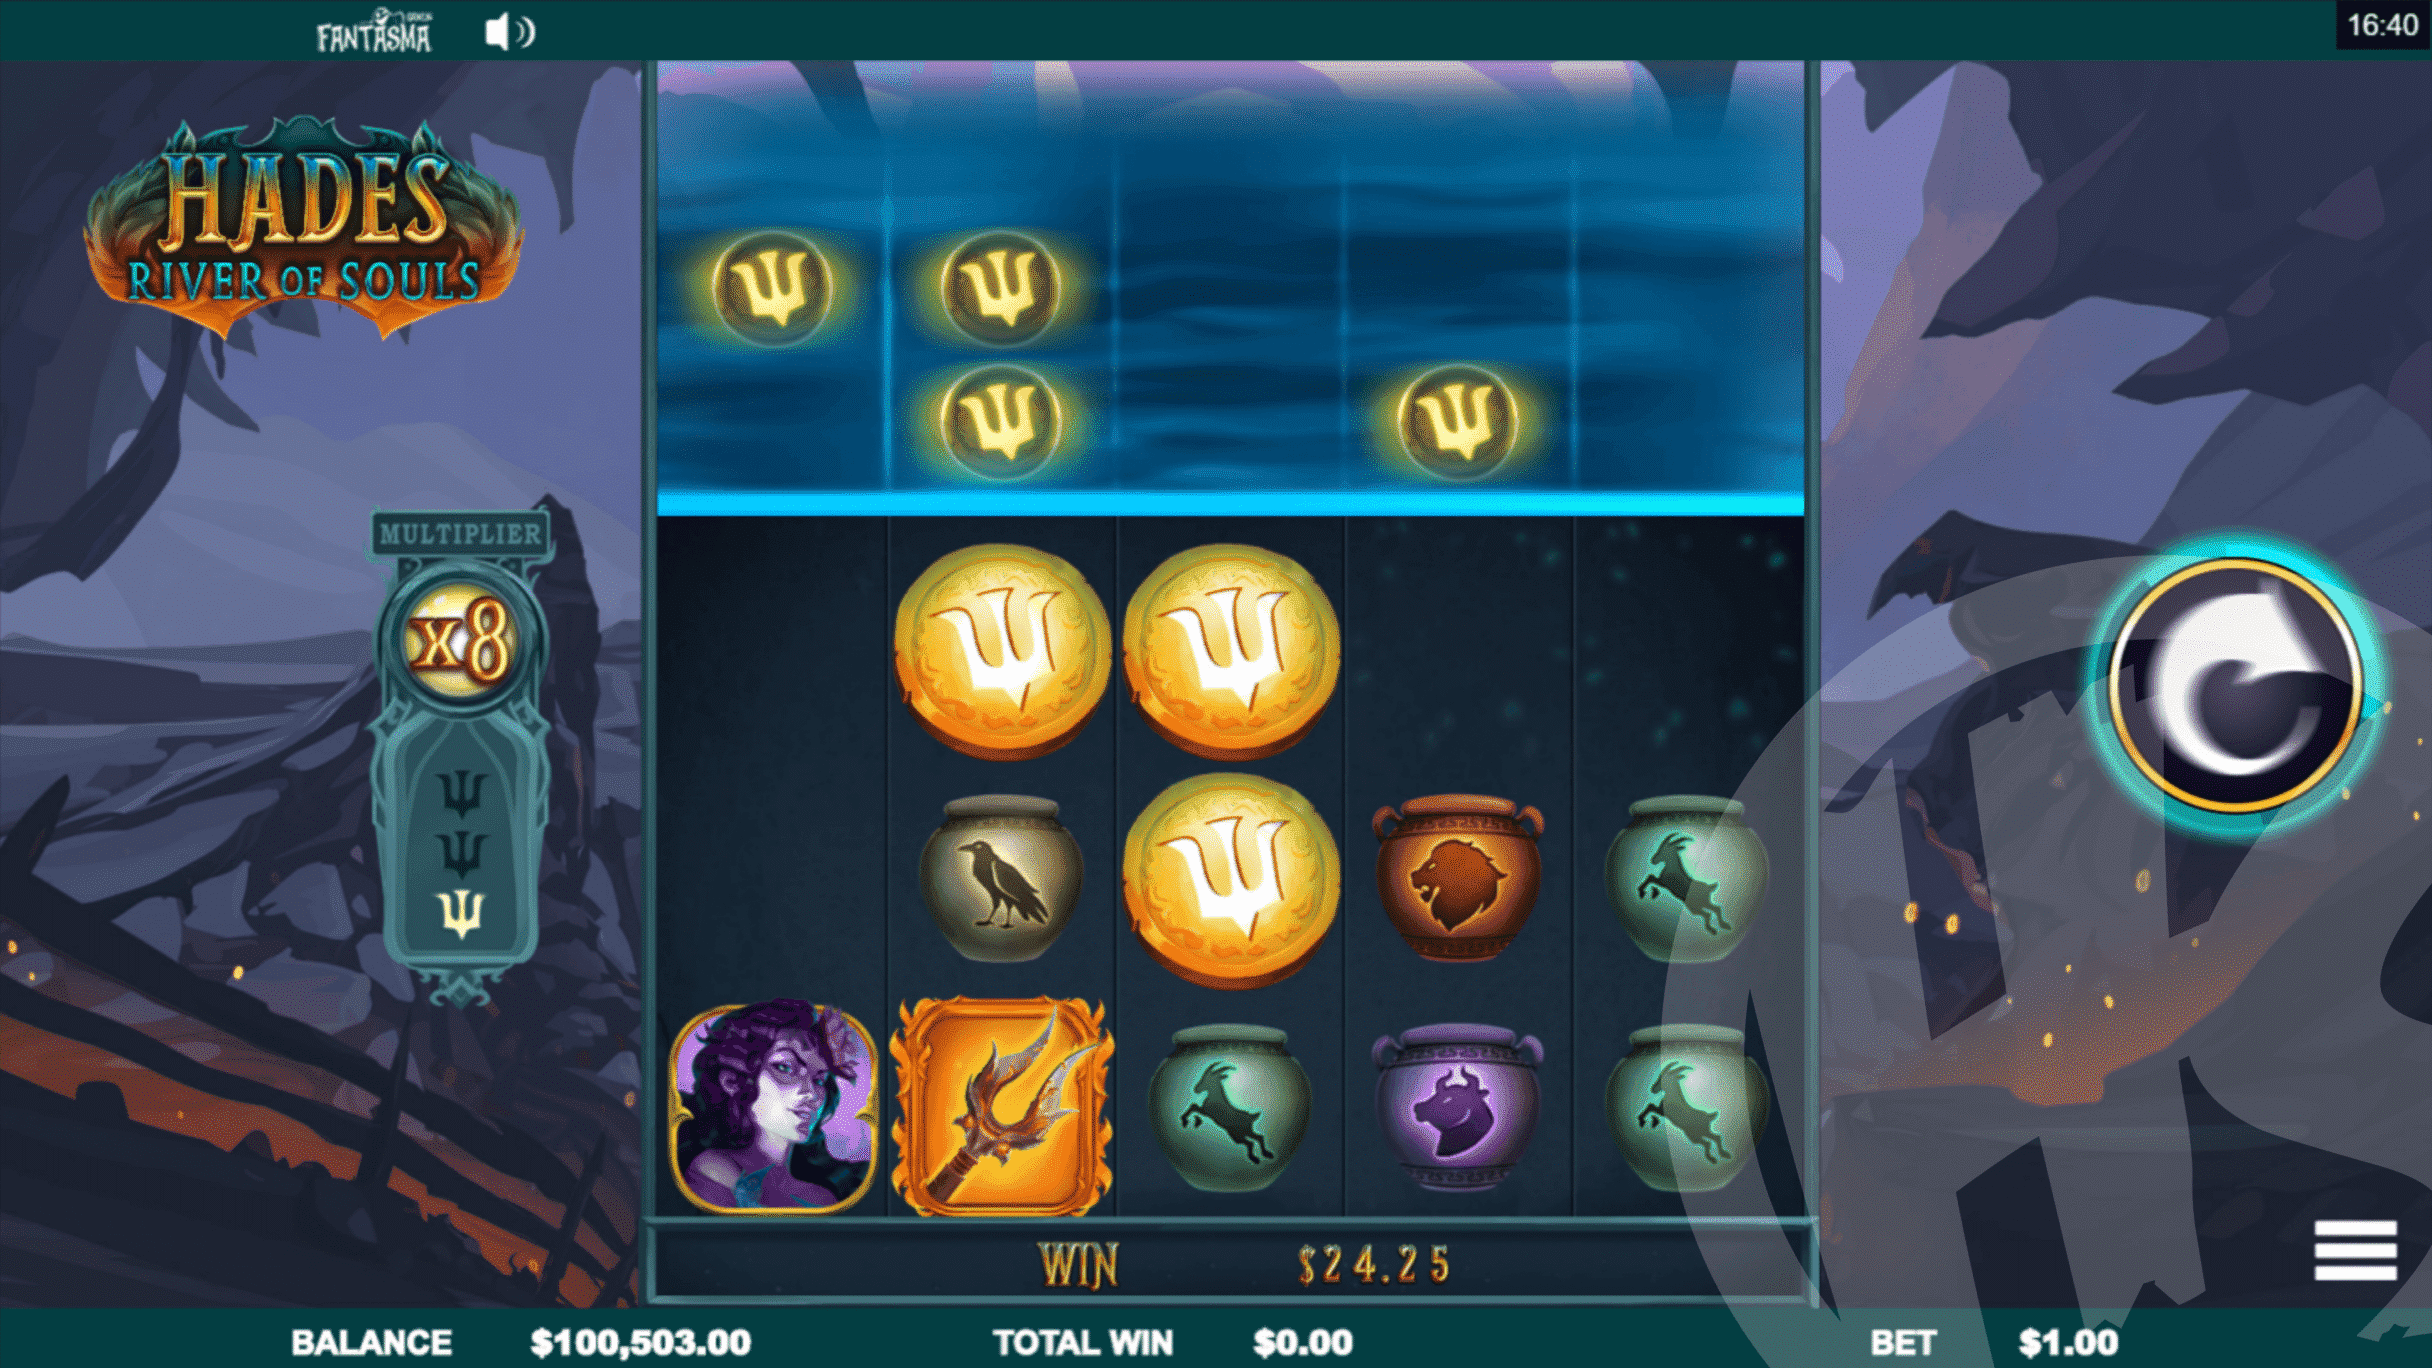 Hades: River of Souls Wild Souls Multiplier